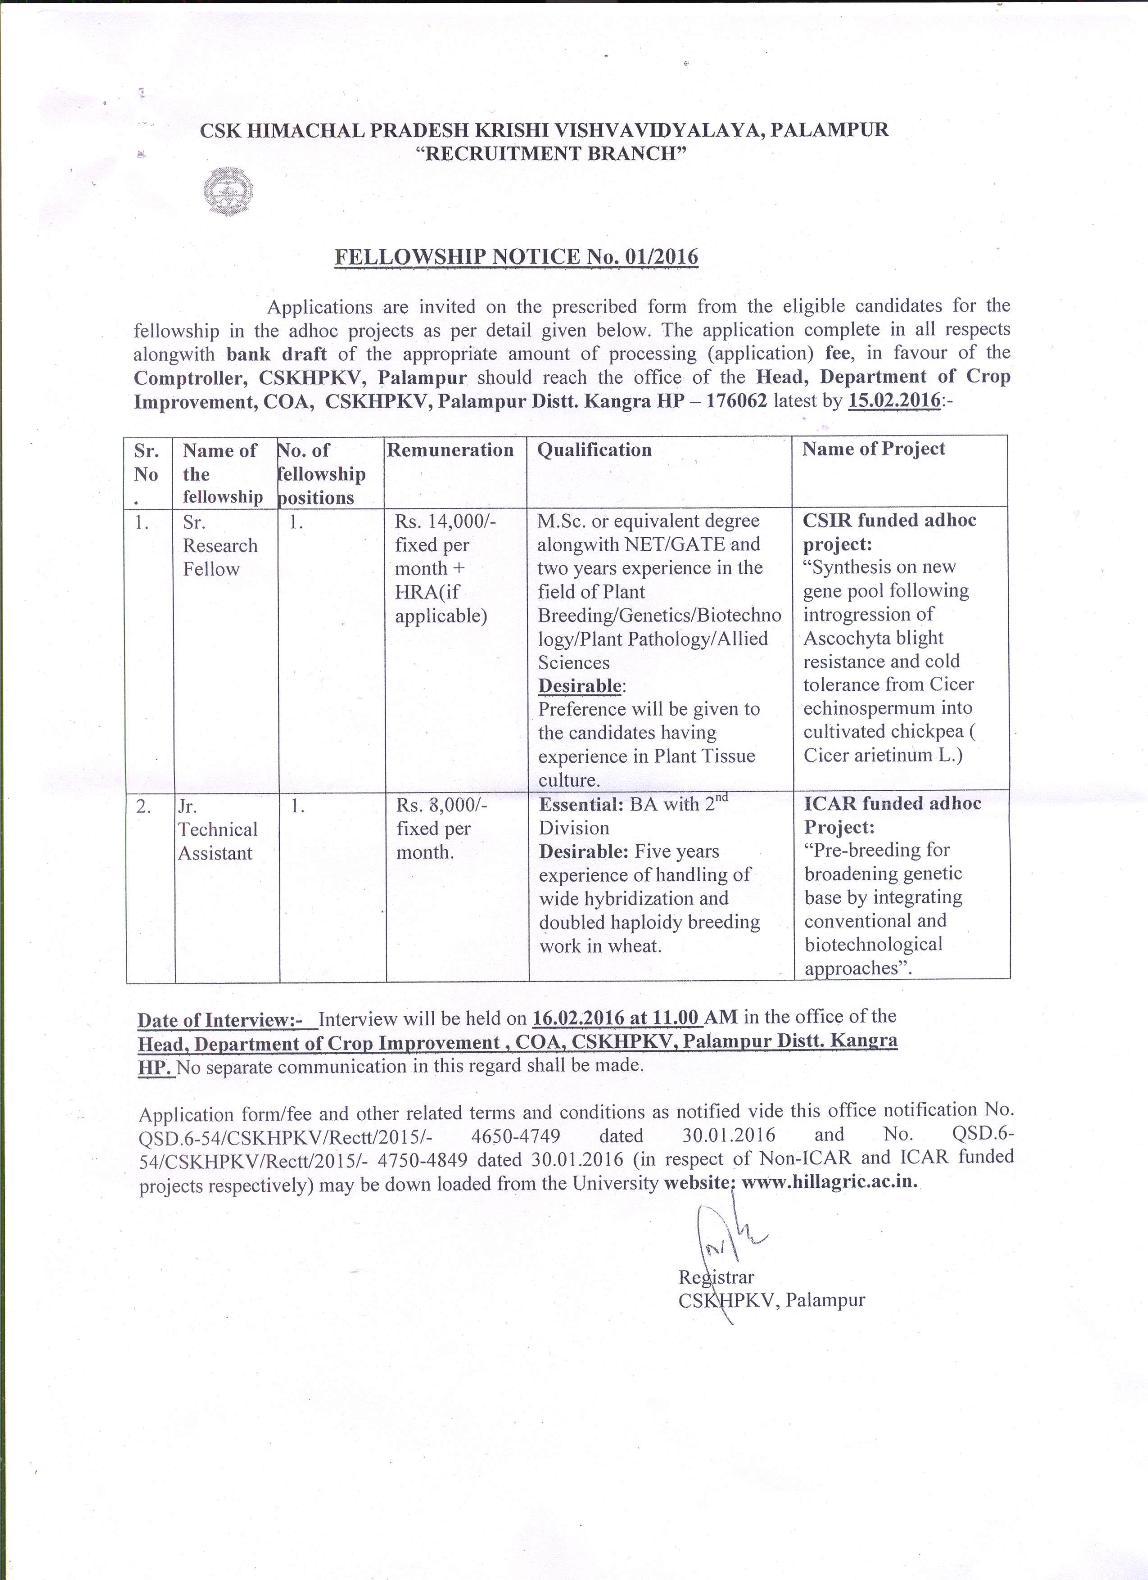 CSK HPKV, Palampur (Job Advertisement)